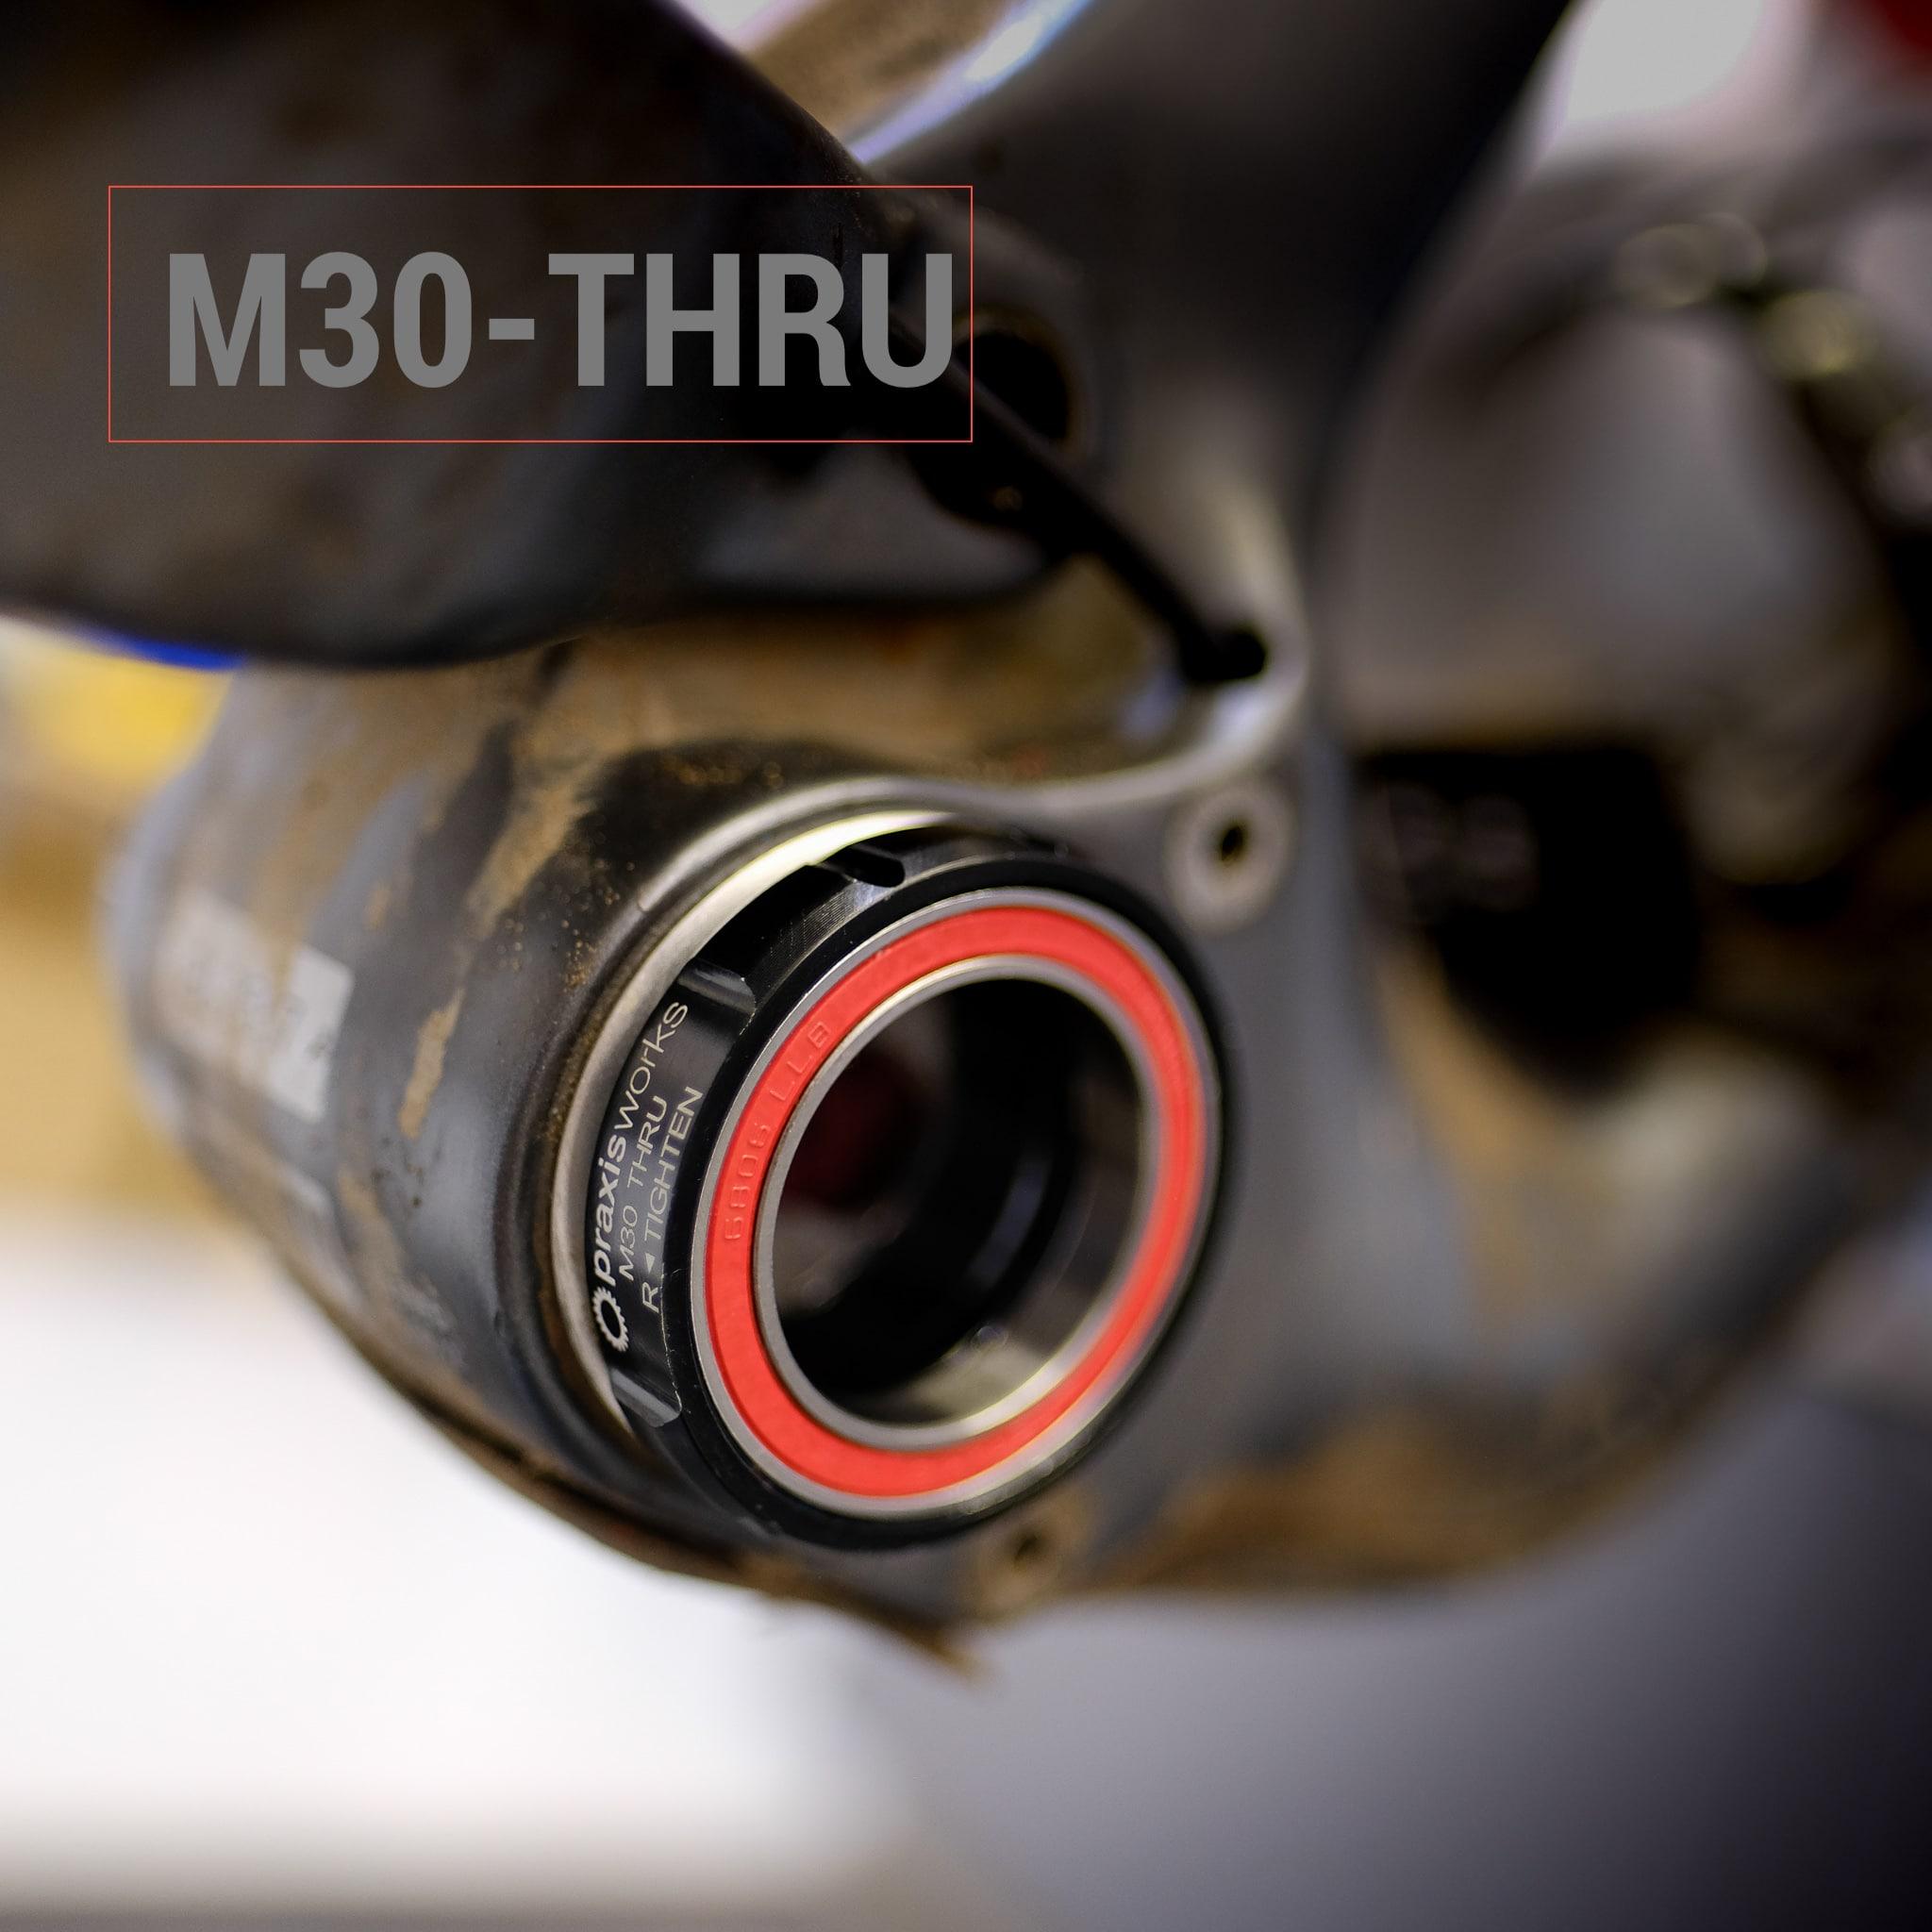 M30-THRU BB PIC